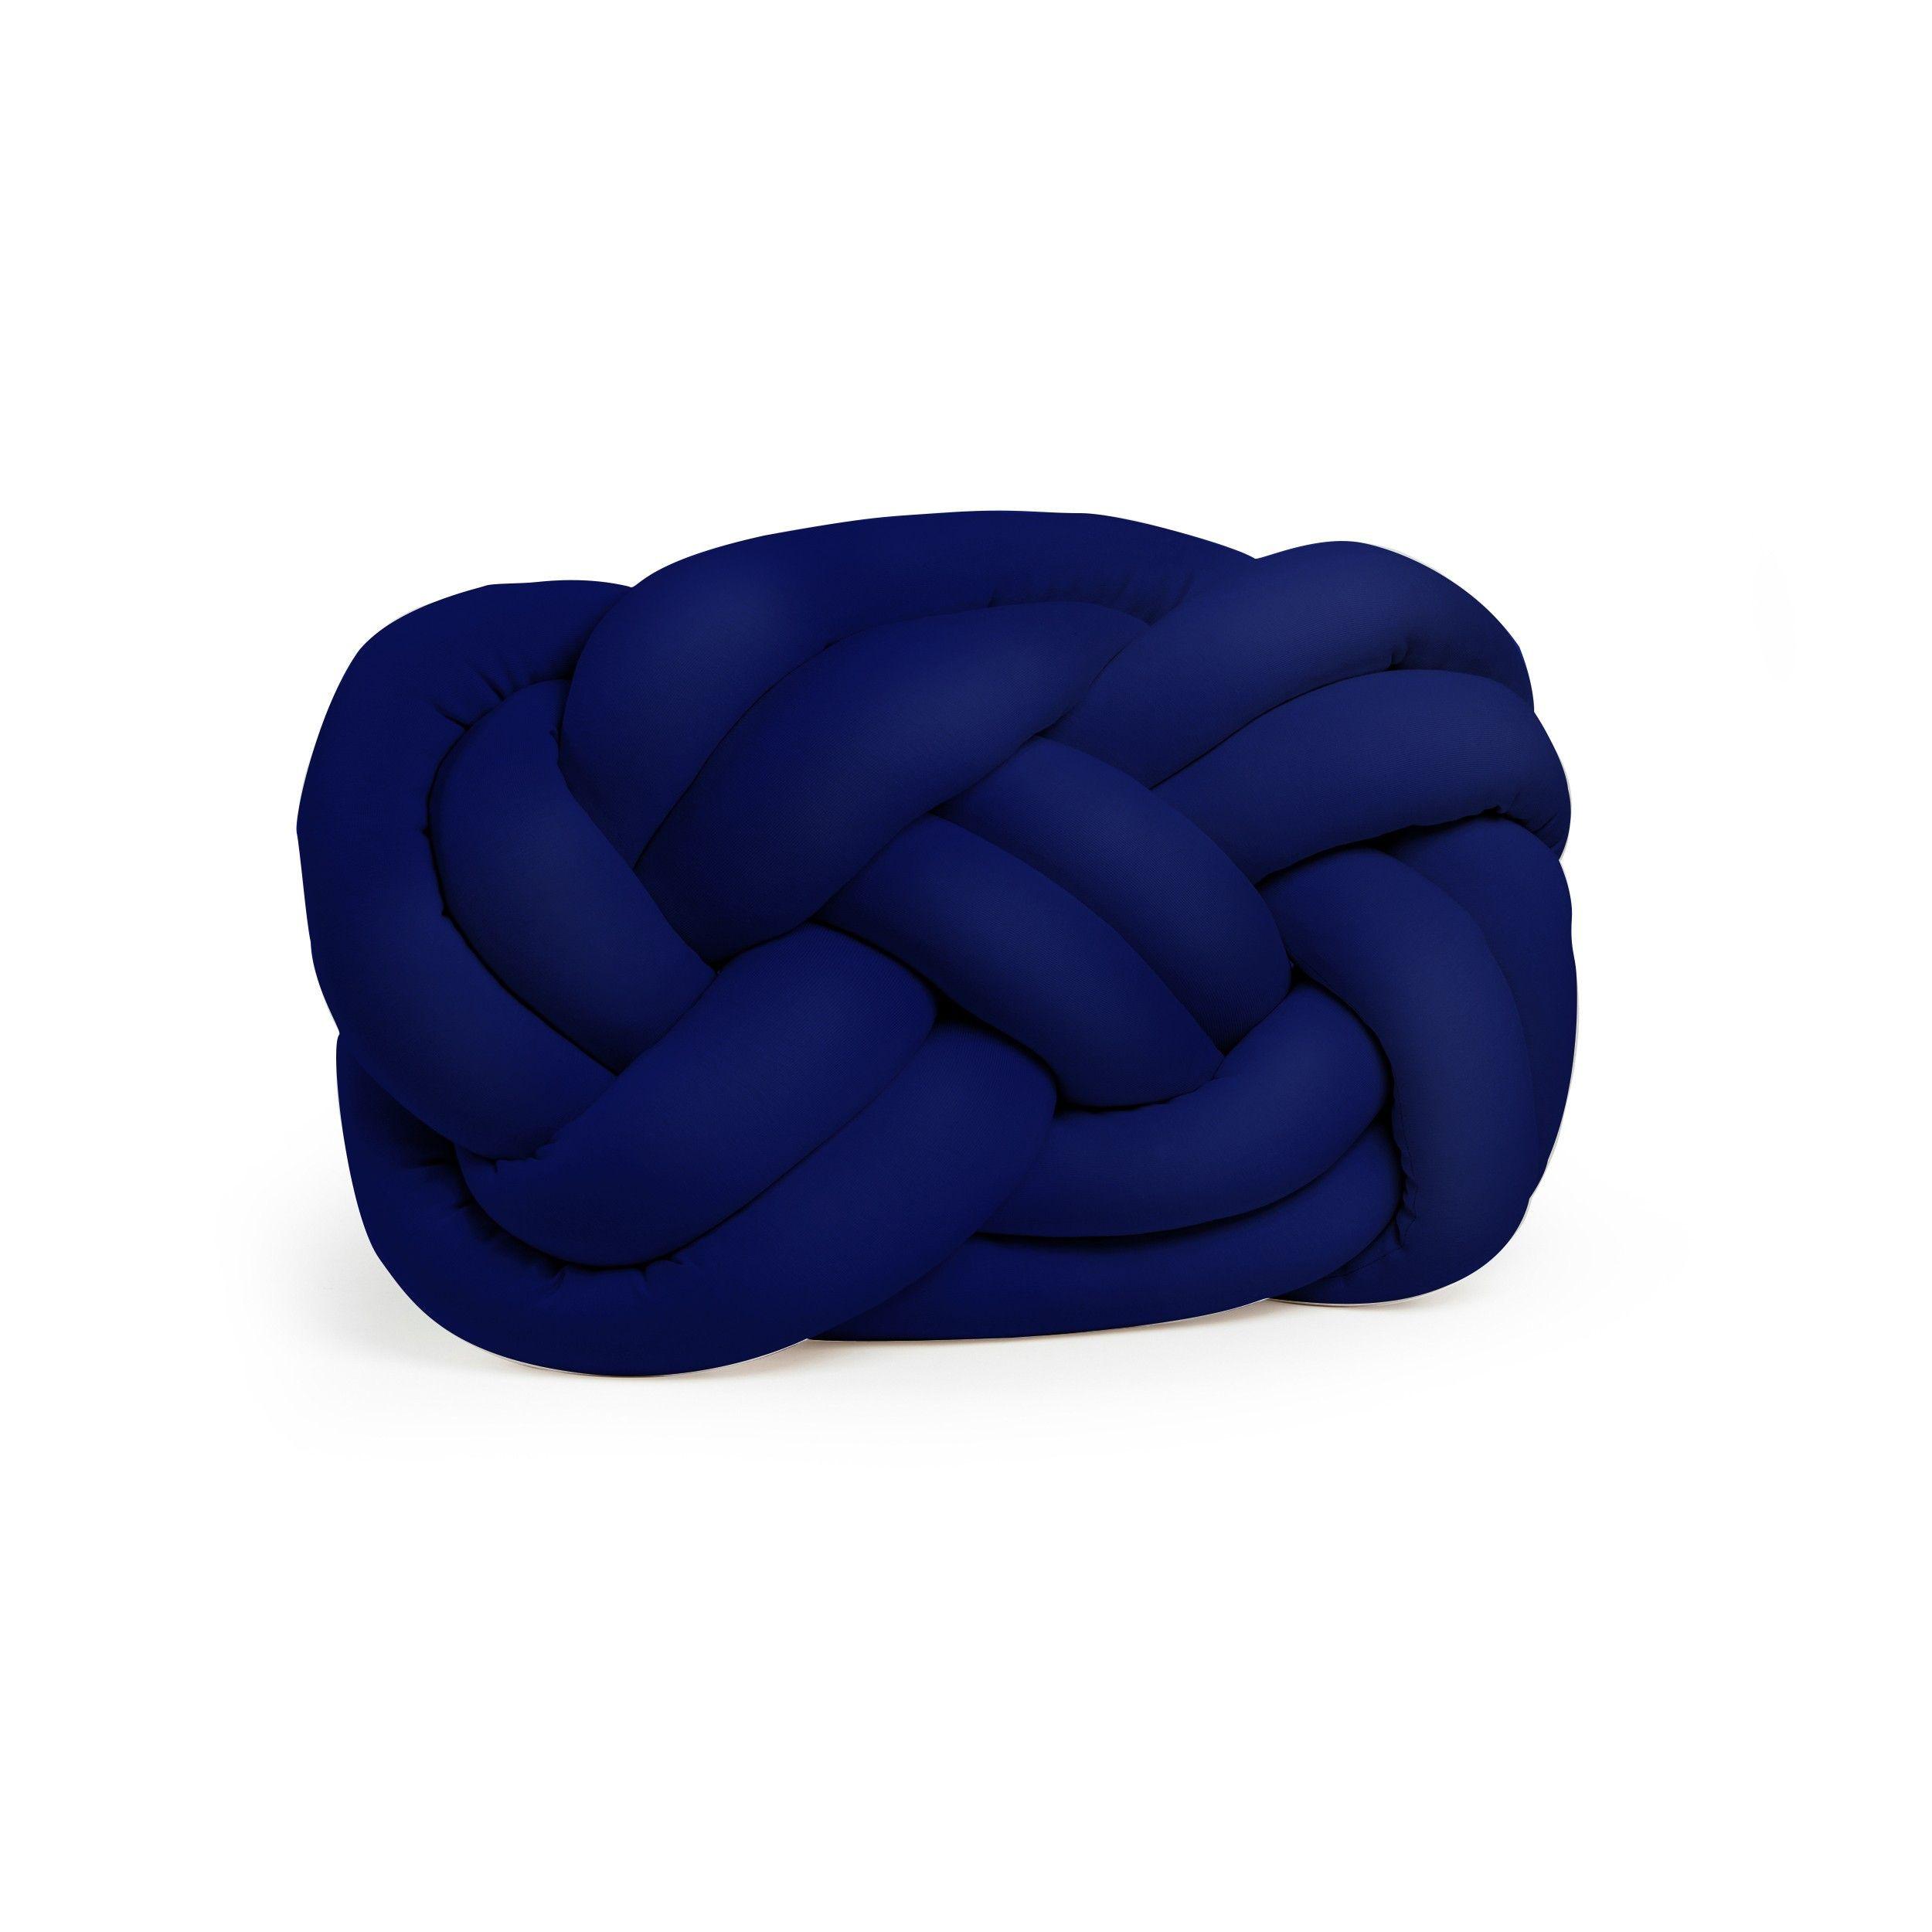 Dekorativer Kissenknoten Polyester | Navy & Indigoblau